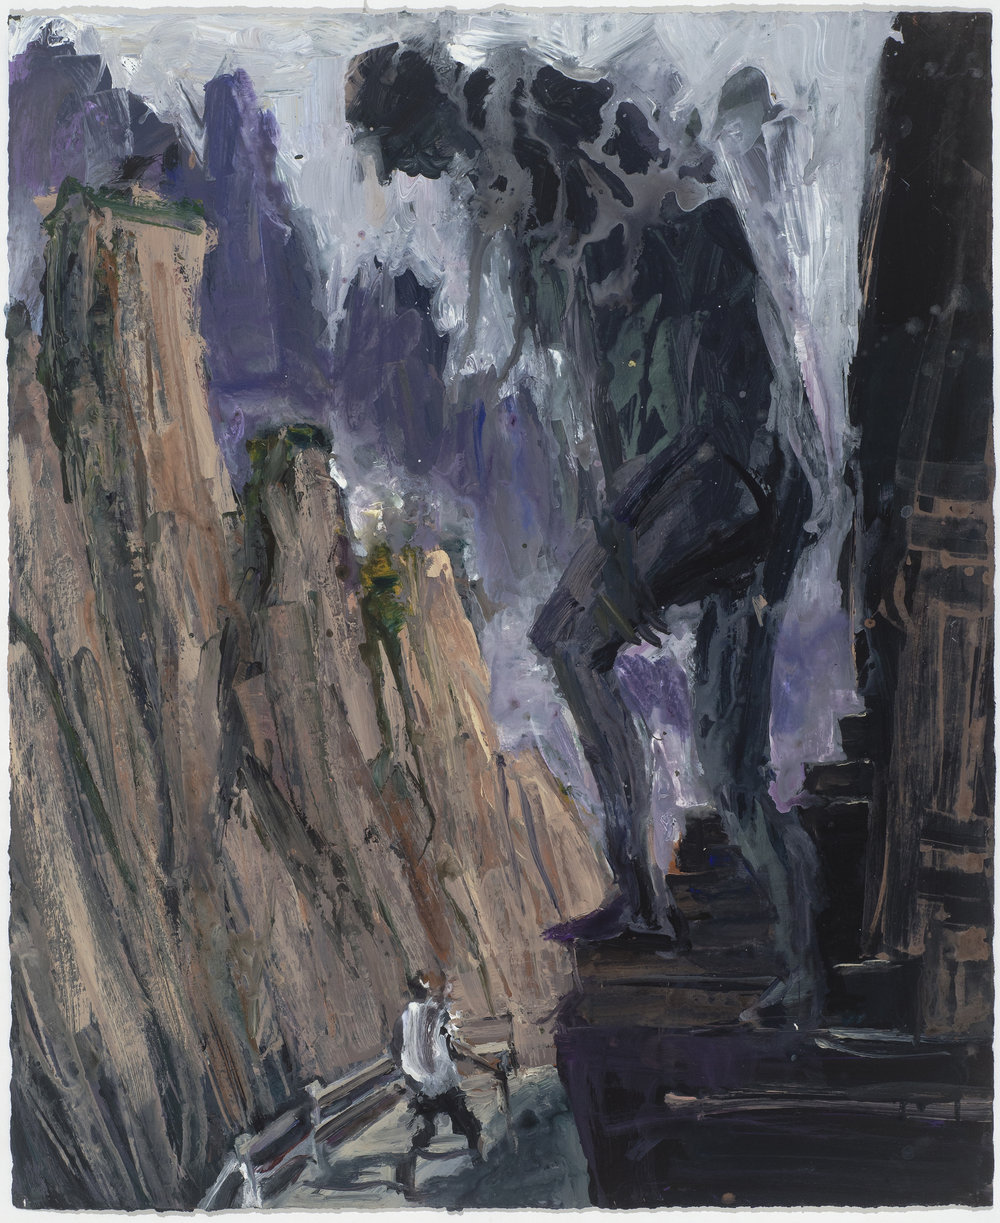 Large Golem study  巨型石人考察   Euan Macleod , 2016  Acrylic on paper, 80 x 66 cm, HKD 29,300 framed